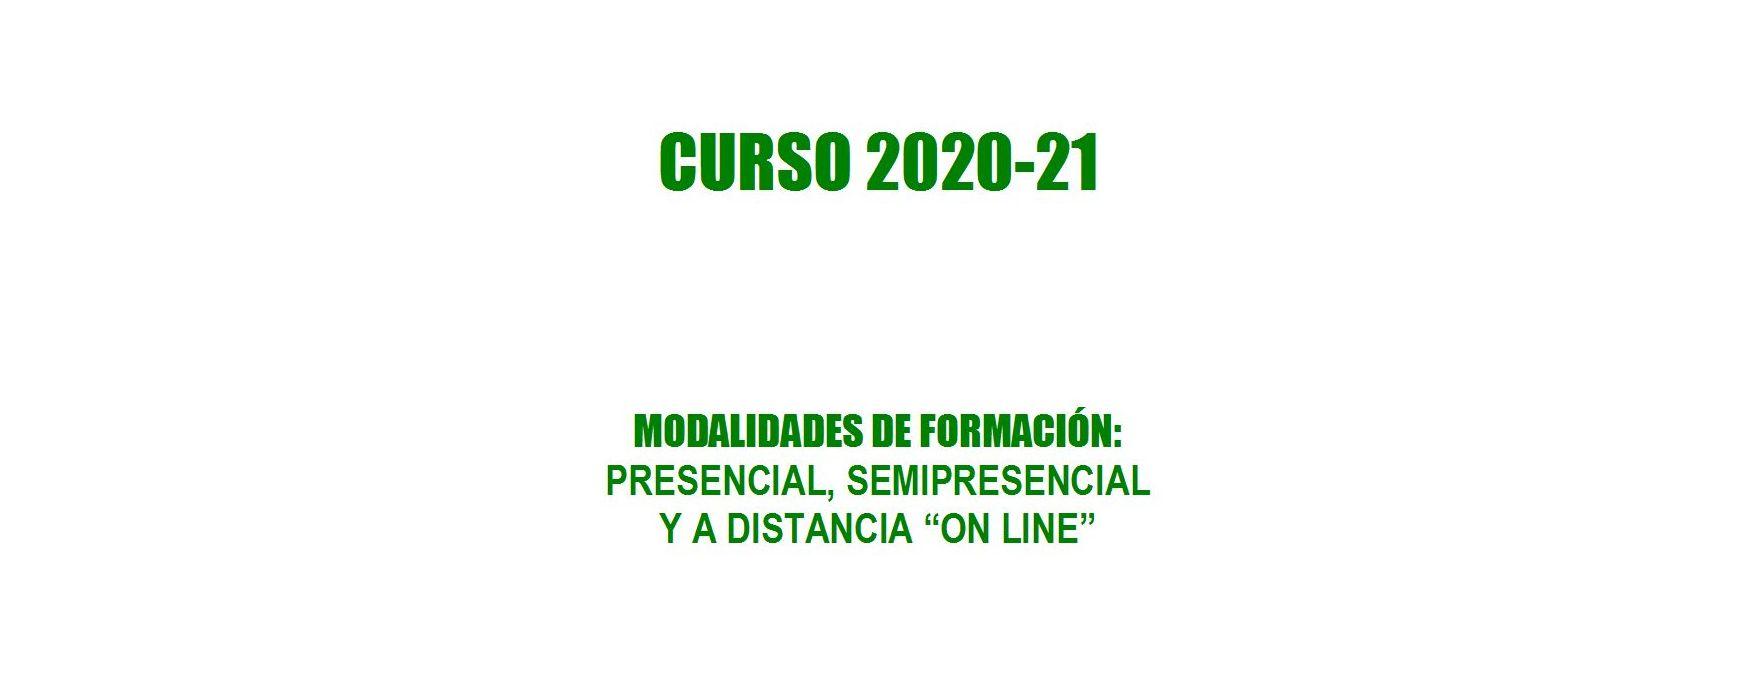 OFERTA FORMATIVA CURSO 2020-21: OFERTA FORMATIVA de Academia Darwin